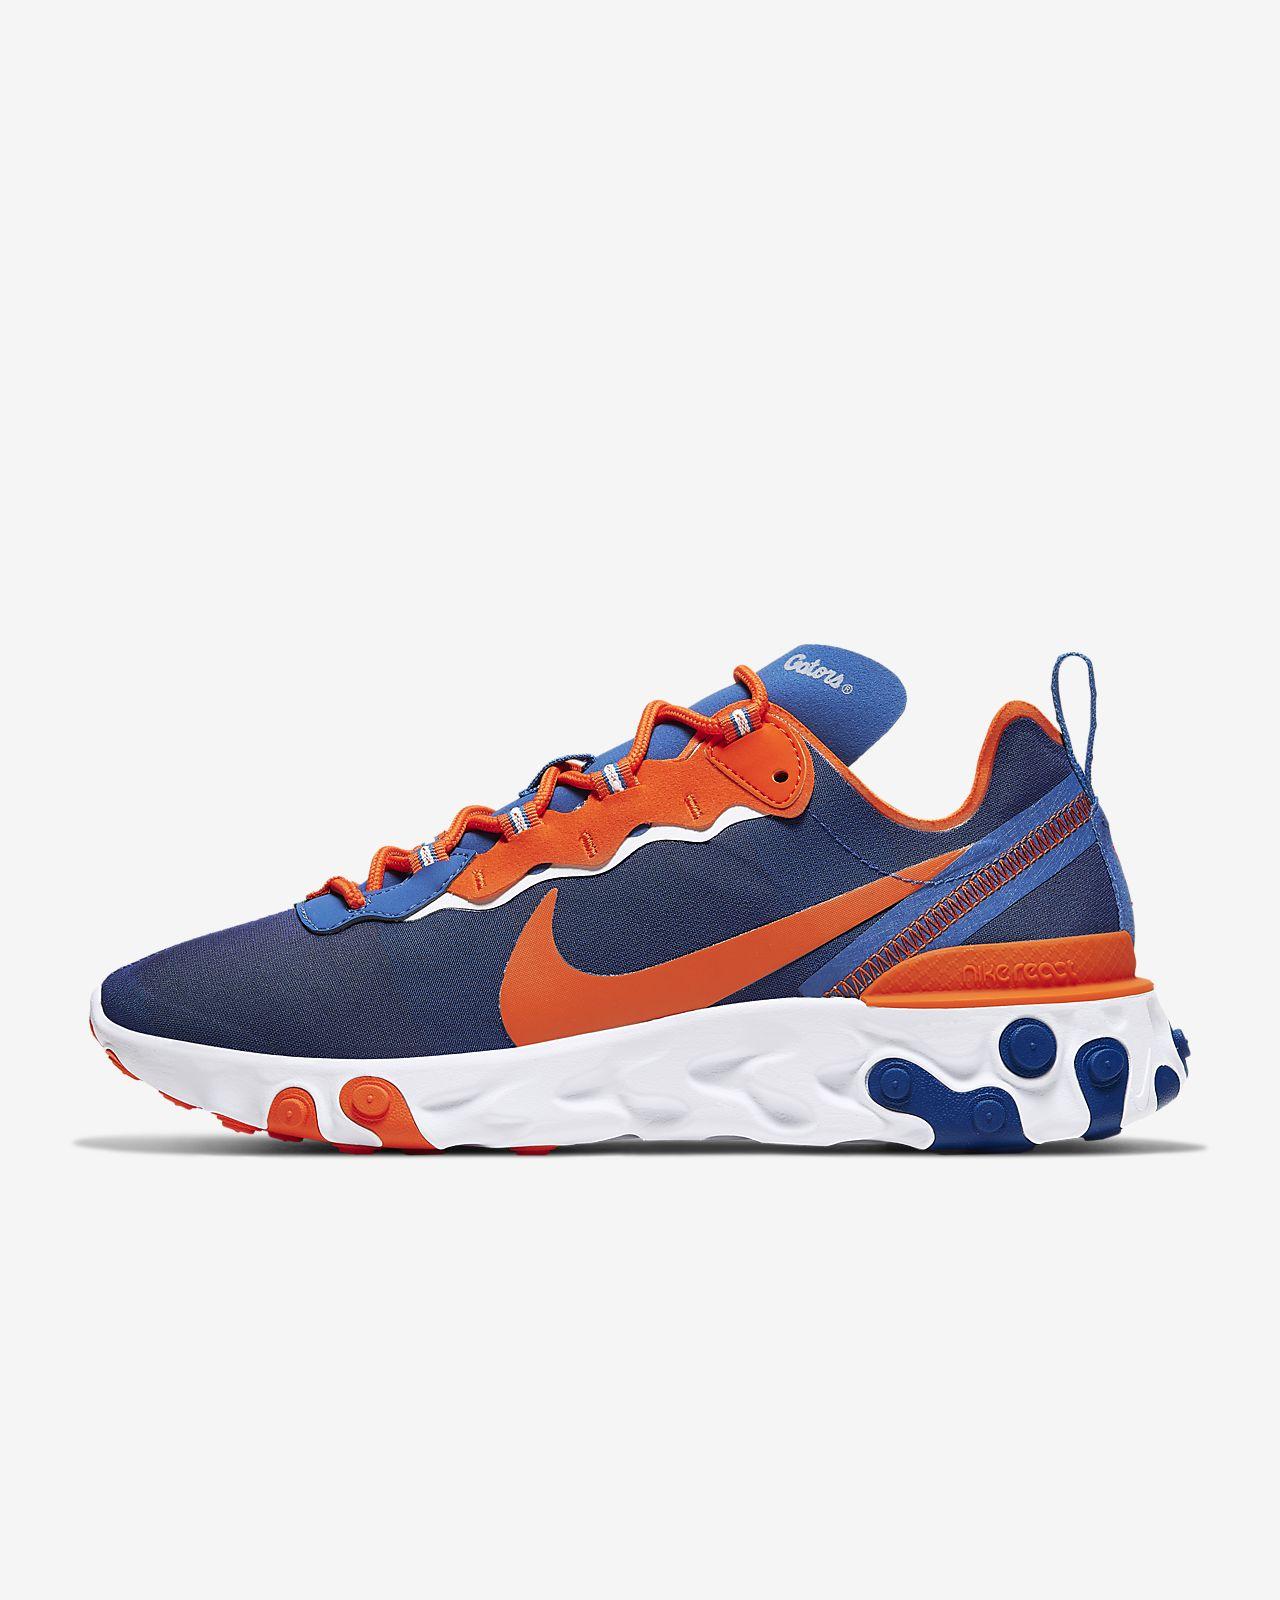 Nike React Element 55 (Florida) Men's Shoe